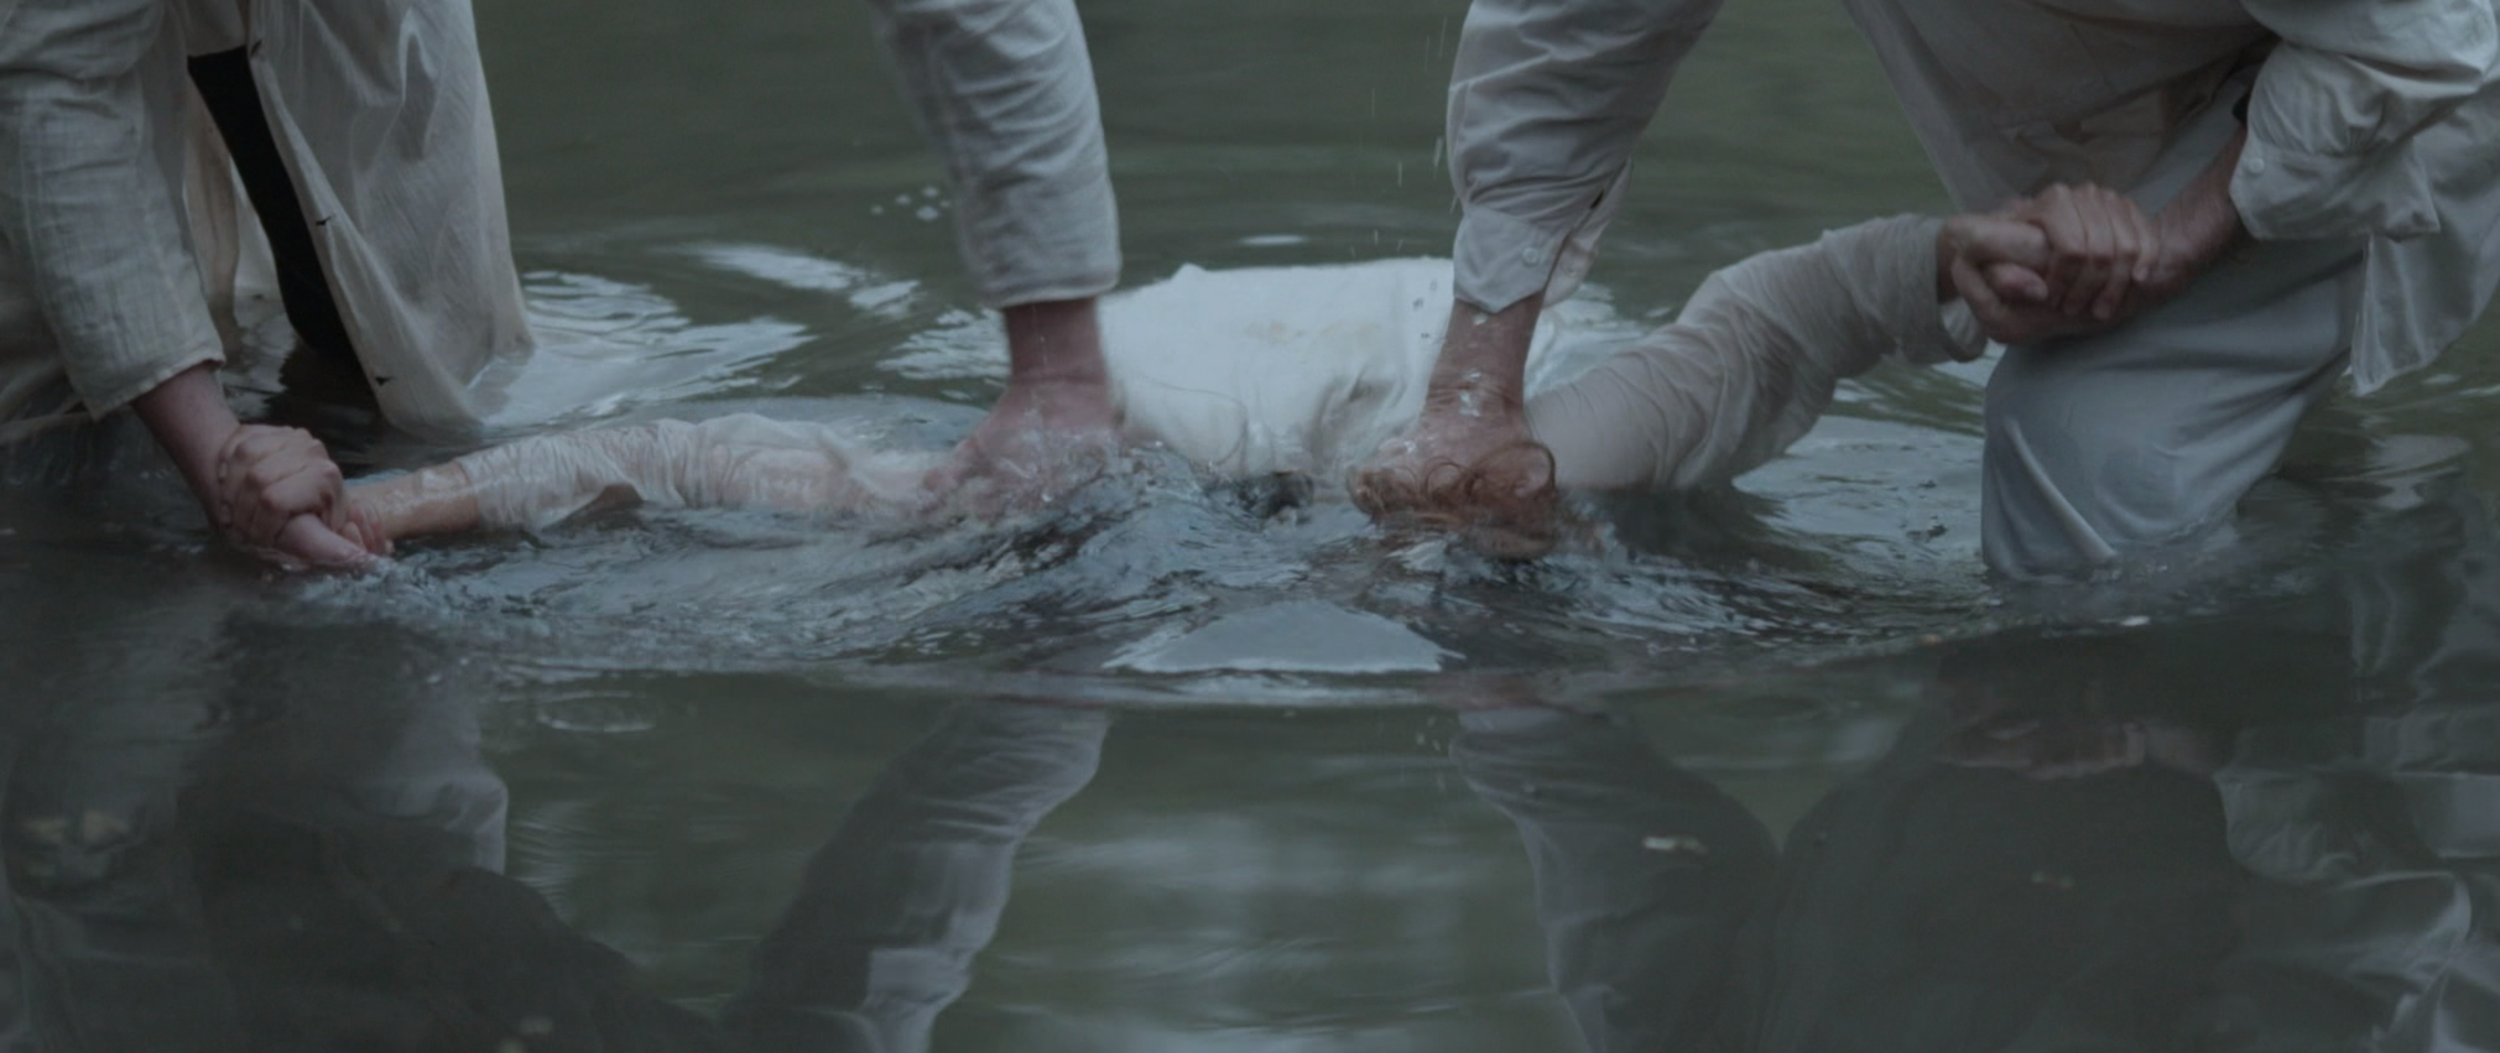 baptism 2.png